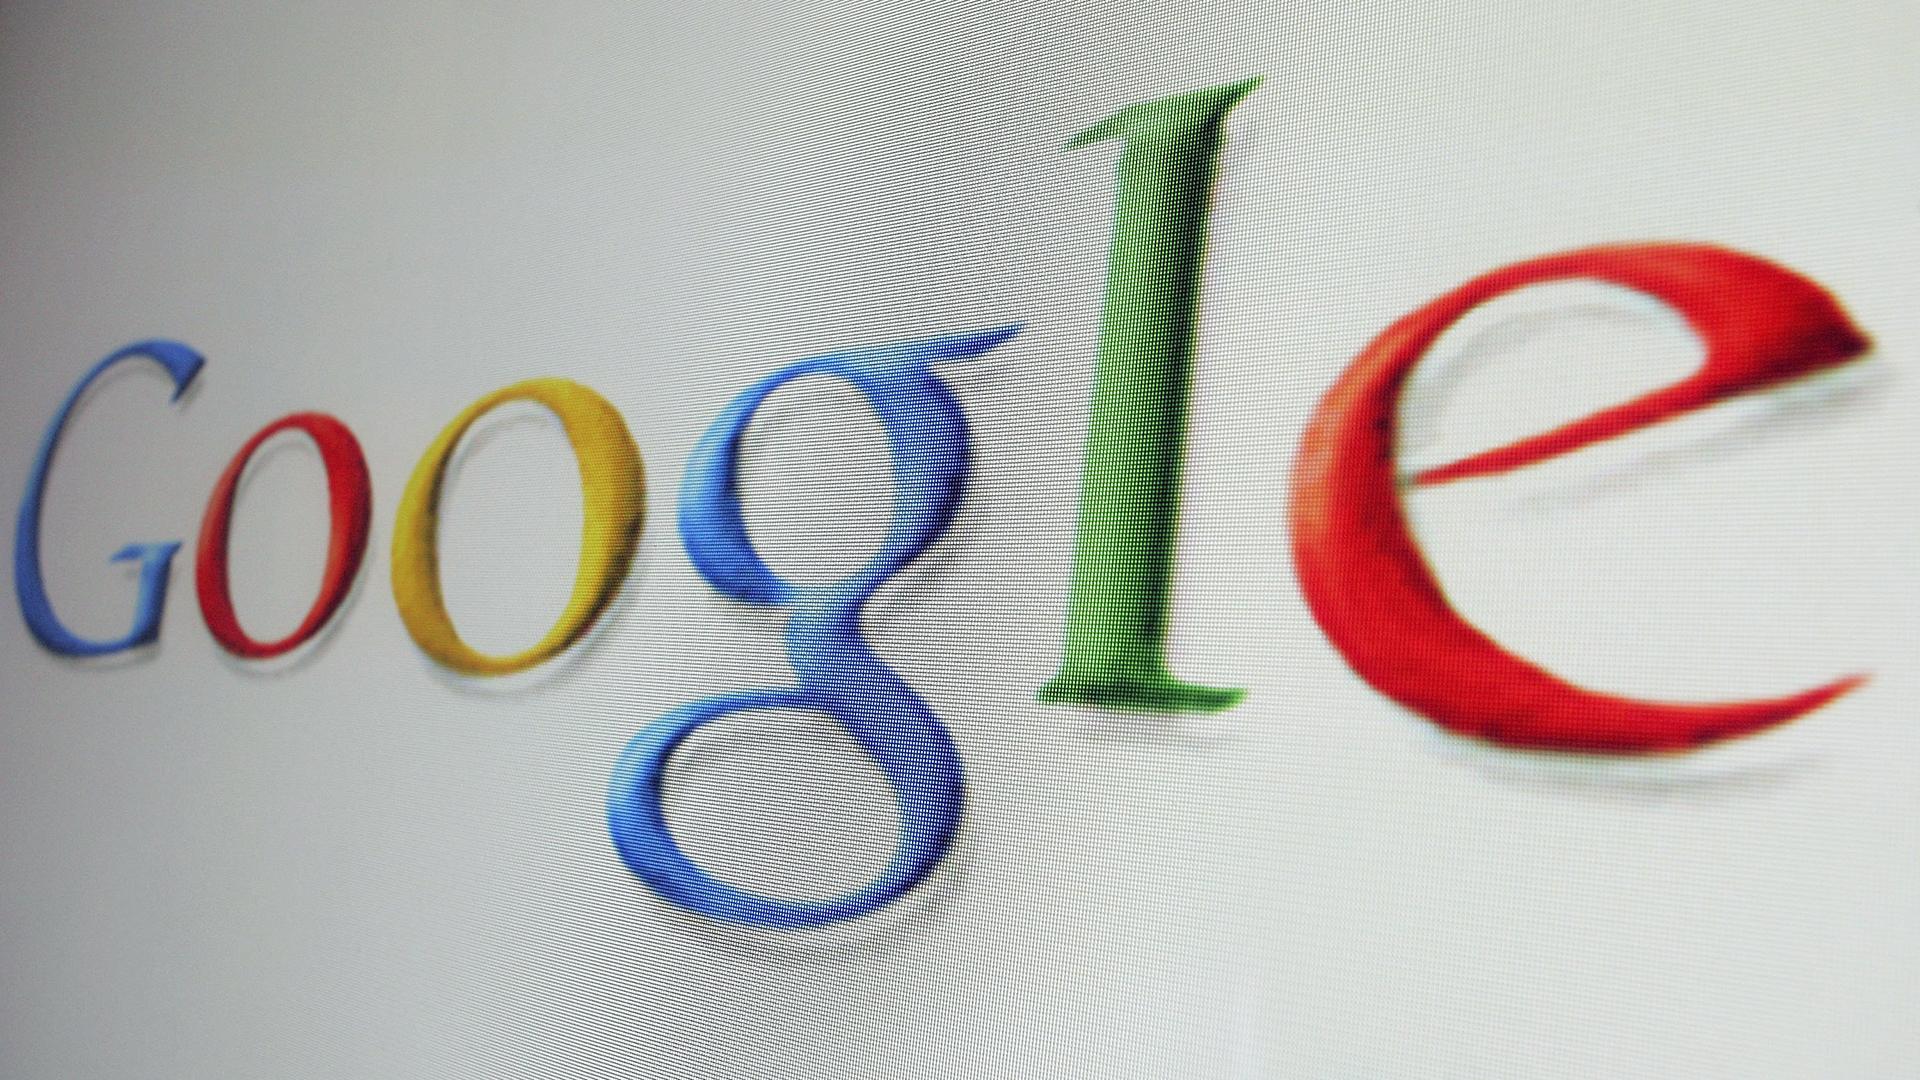 Google Logo on Computer-159532.jpg68043161